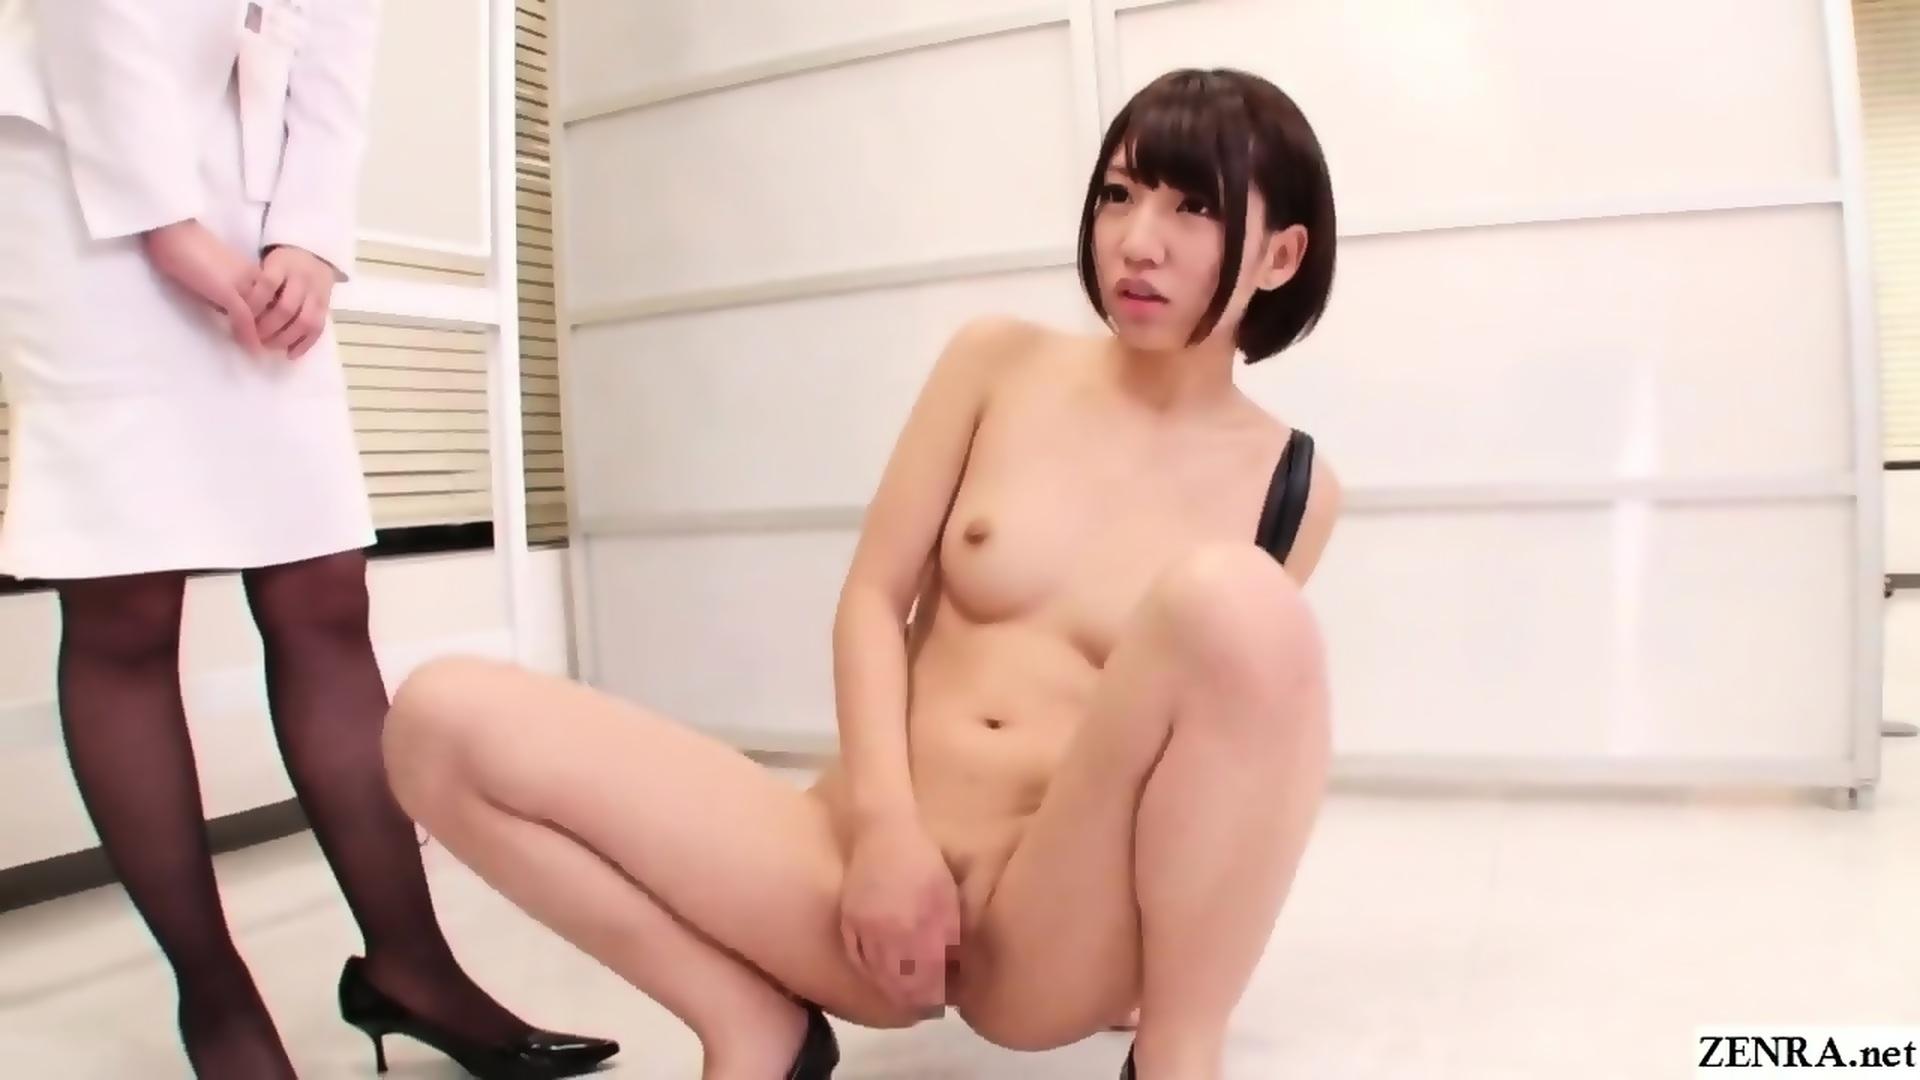 Midget girl porn video